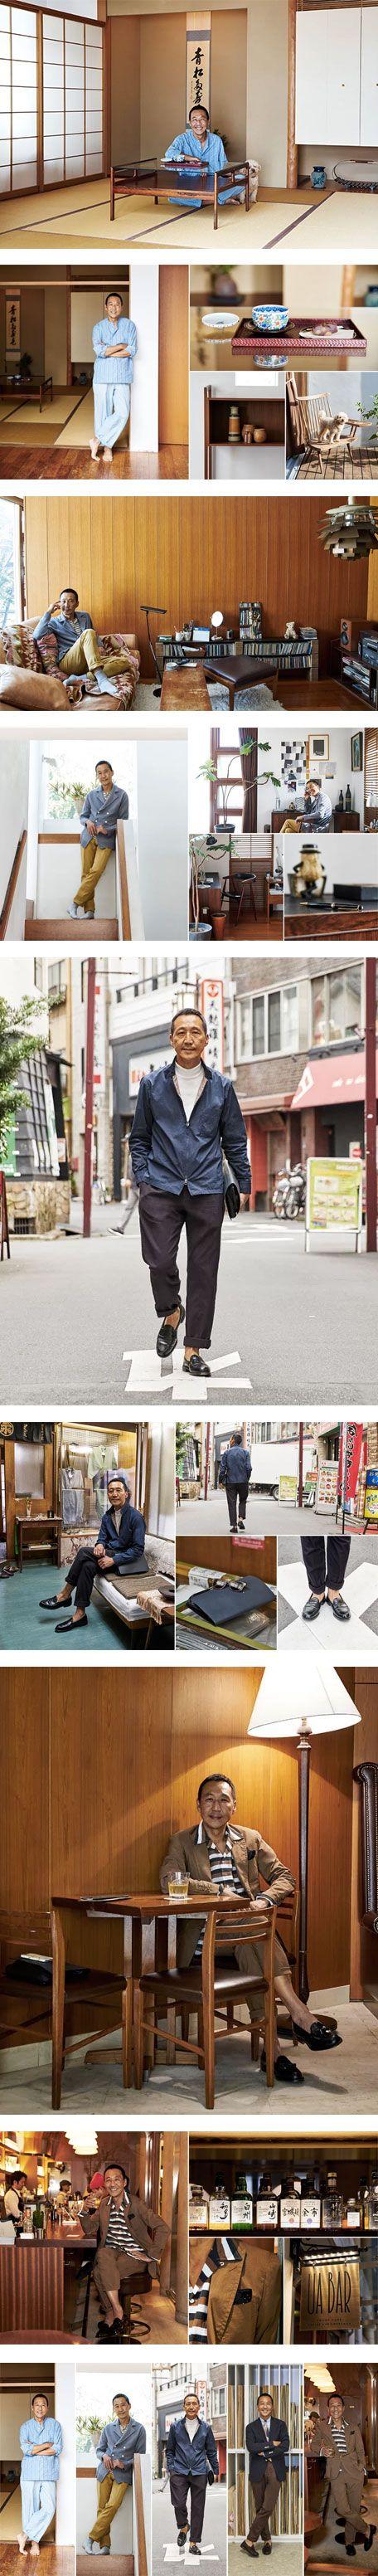 A conversation with Mr Yasuto Kamoshita featuring Shirts, Clothing and Sweaters on Nuji.com #menswear #style #yasutokamoshita